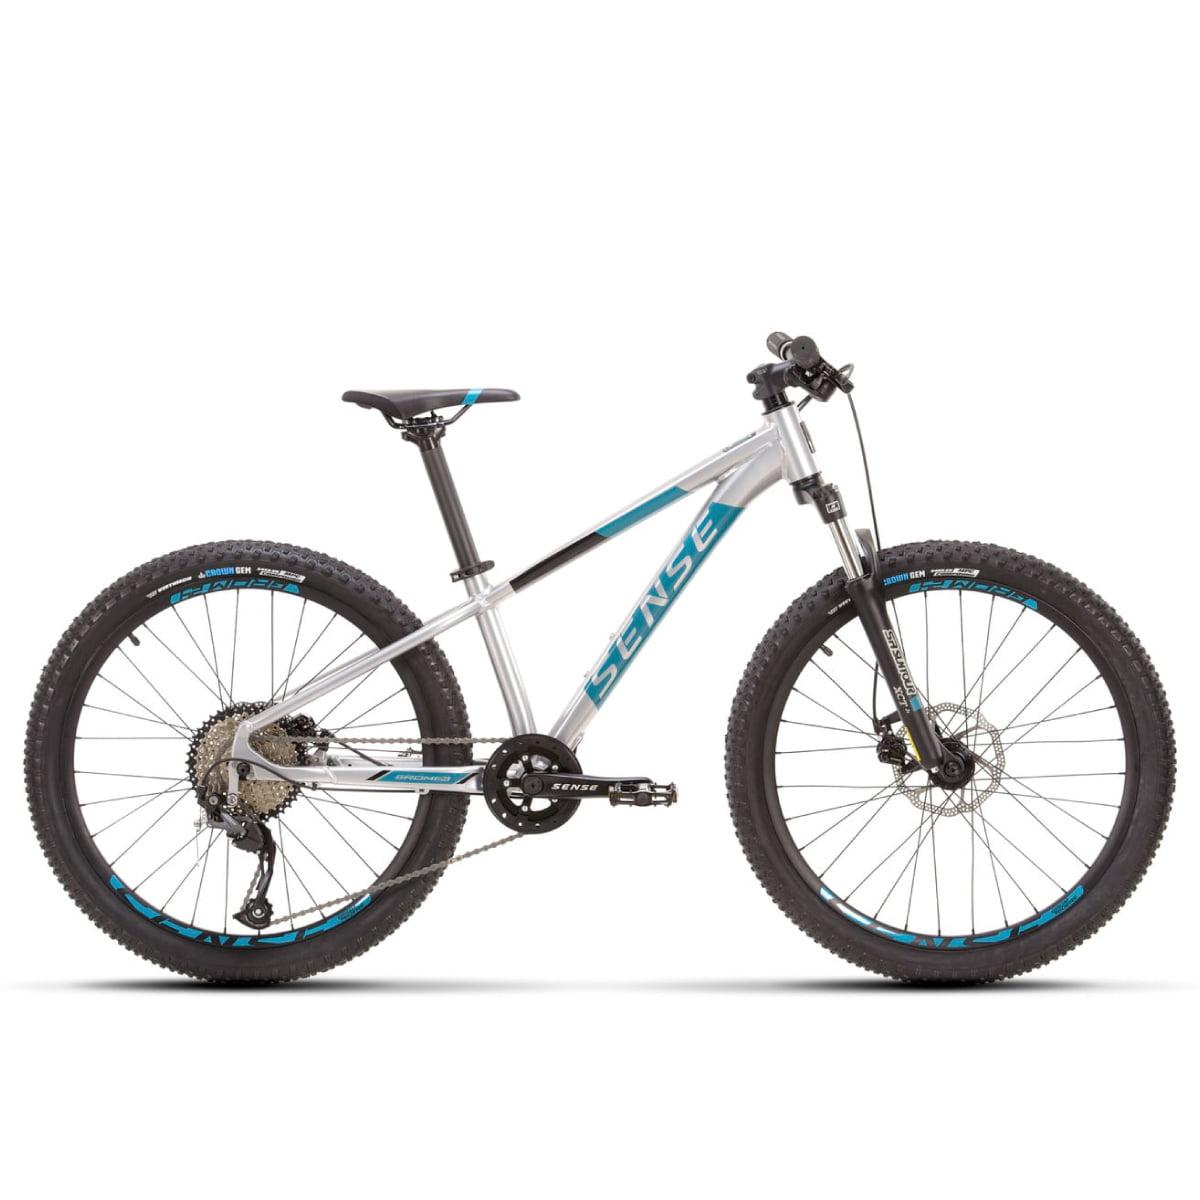 Bike Sense Grom 24 2021 Shimano 9v Aluminio e Aqua